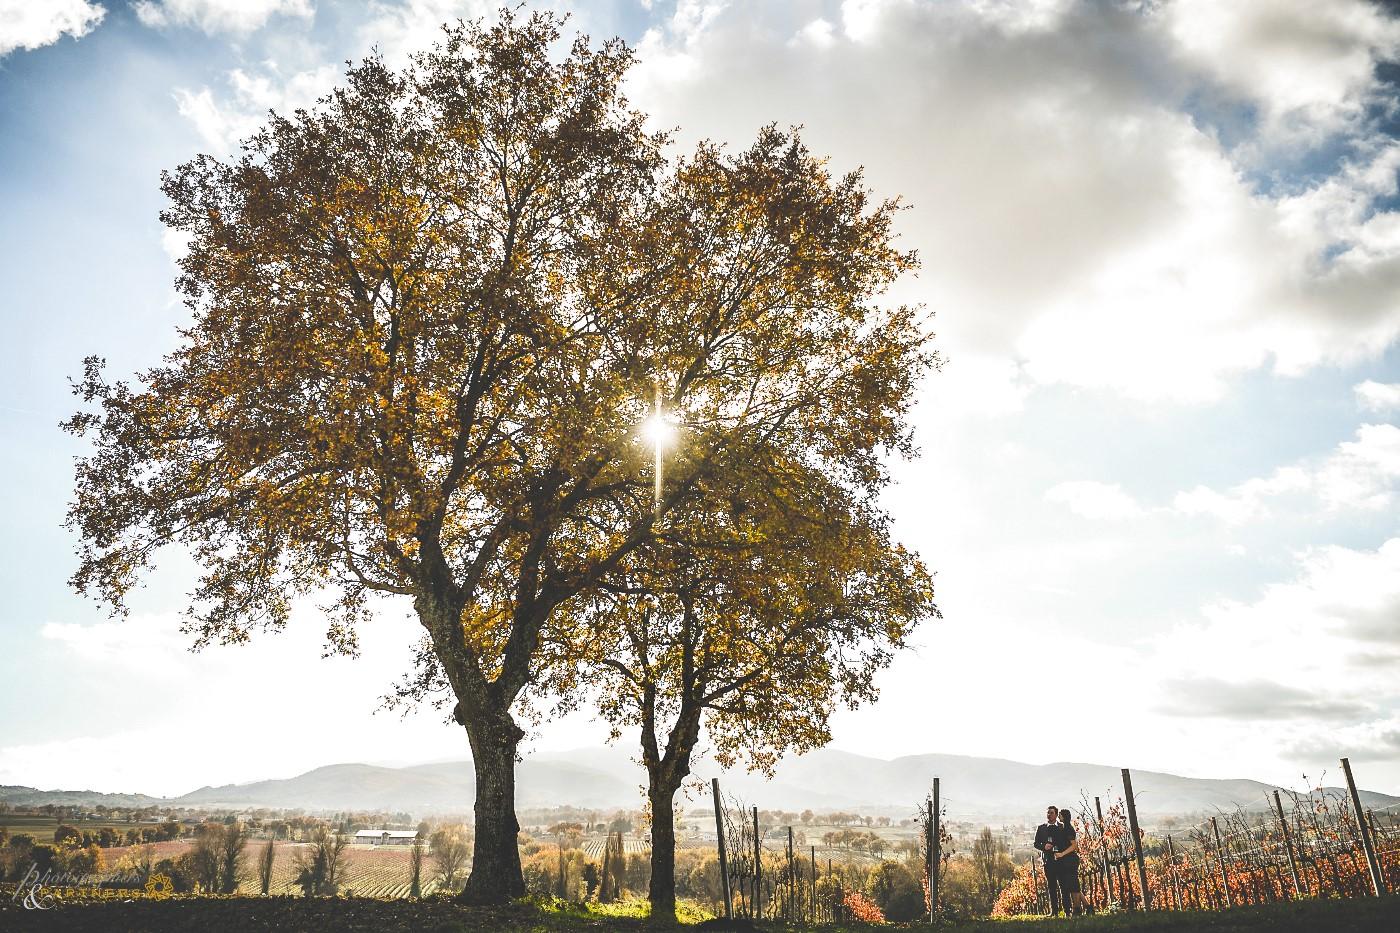 A beautiful postcard of the Umbrian landscape.